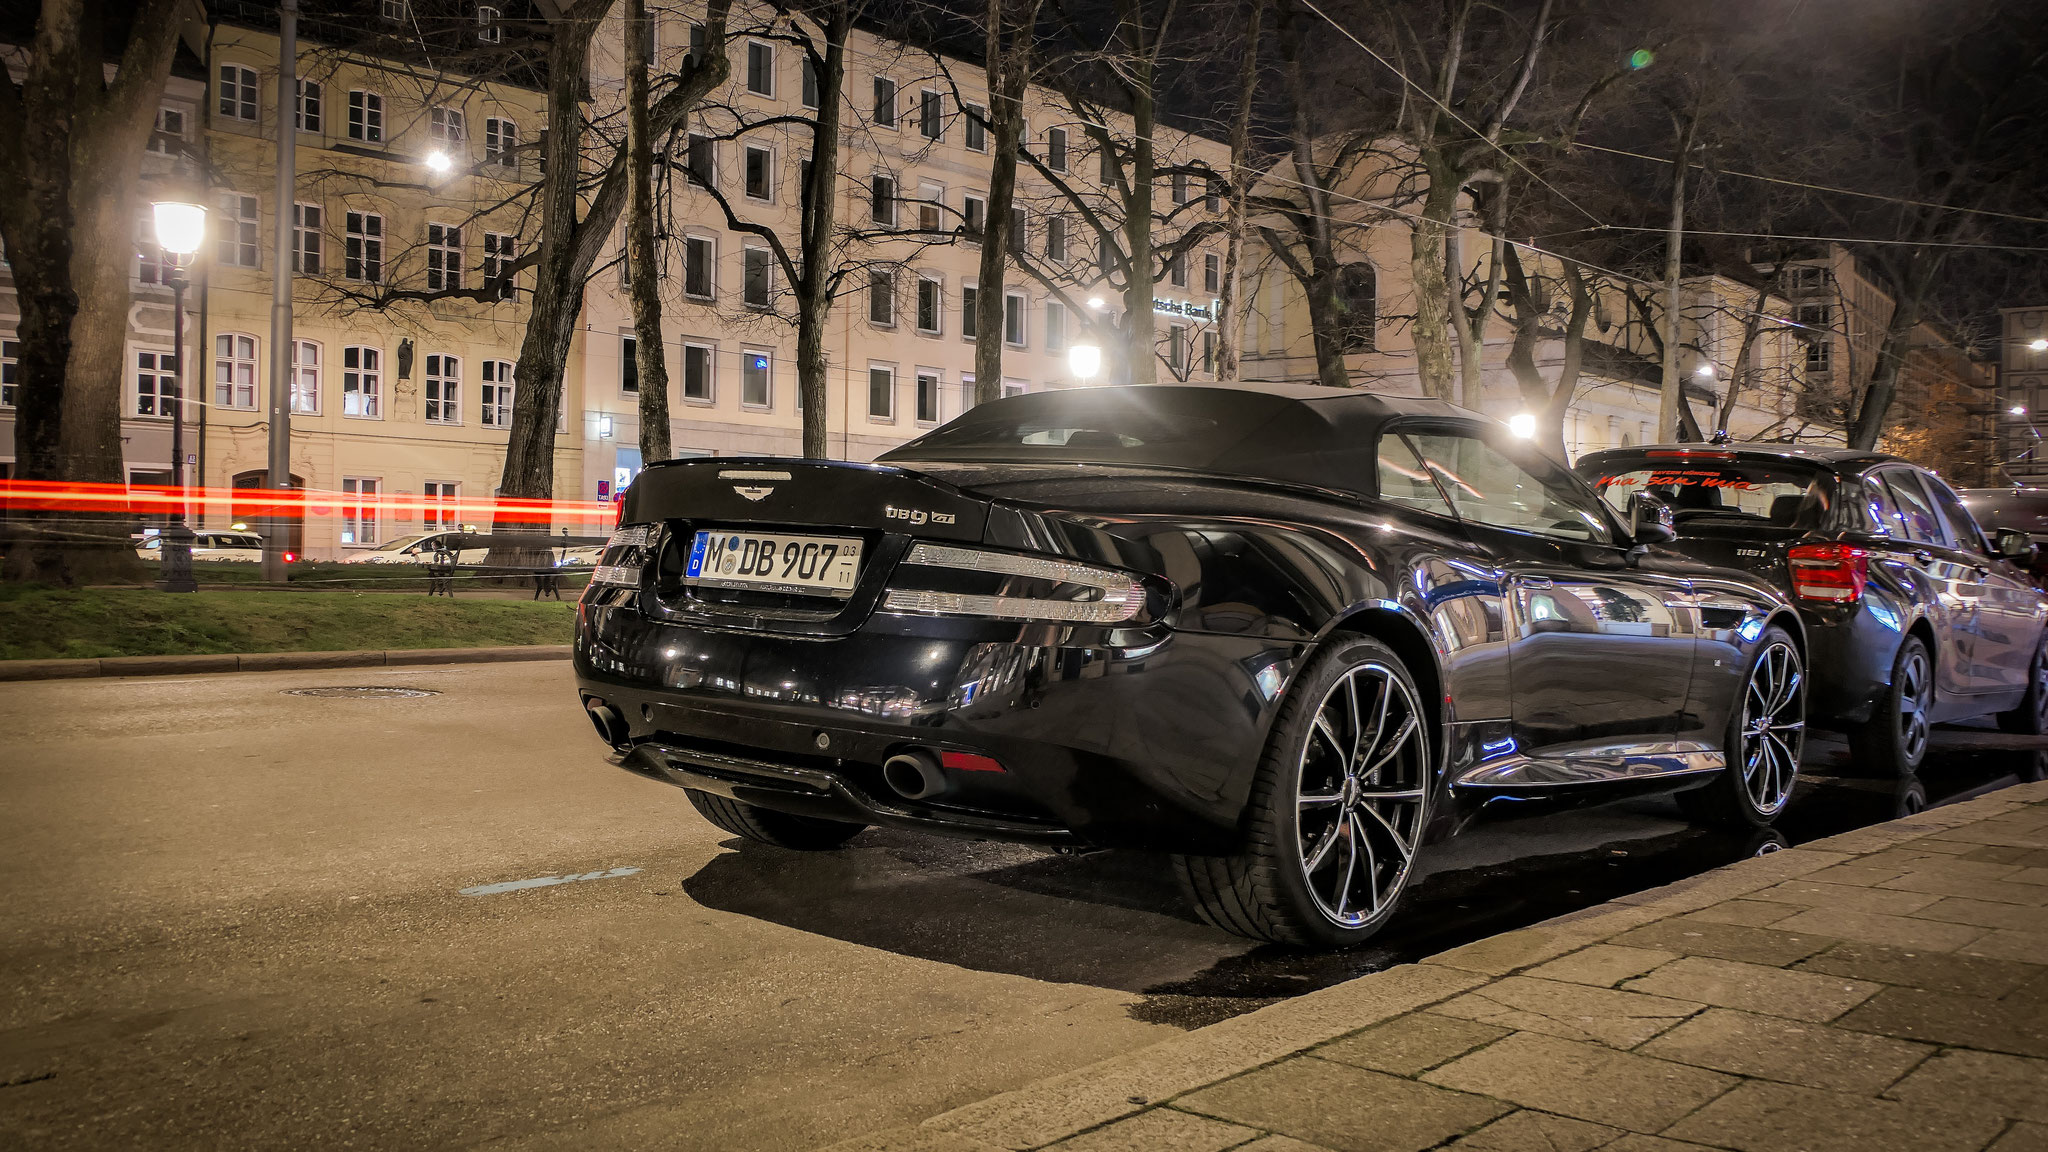 Aston Martin DB9 GT Volante - M-DB-907